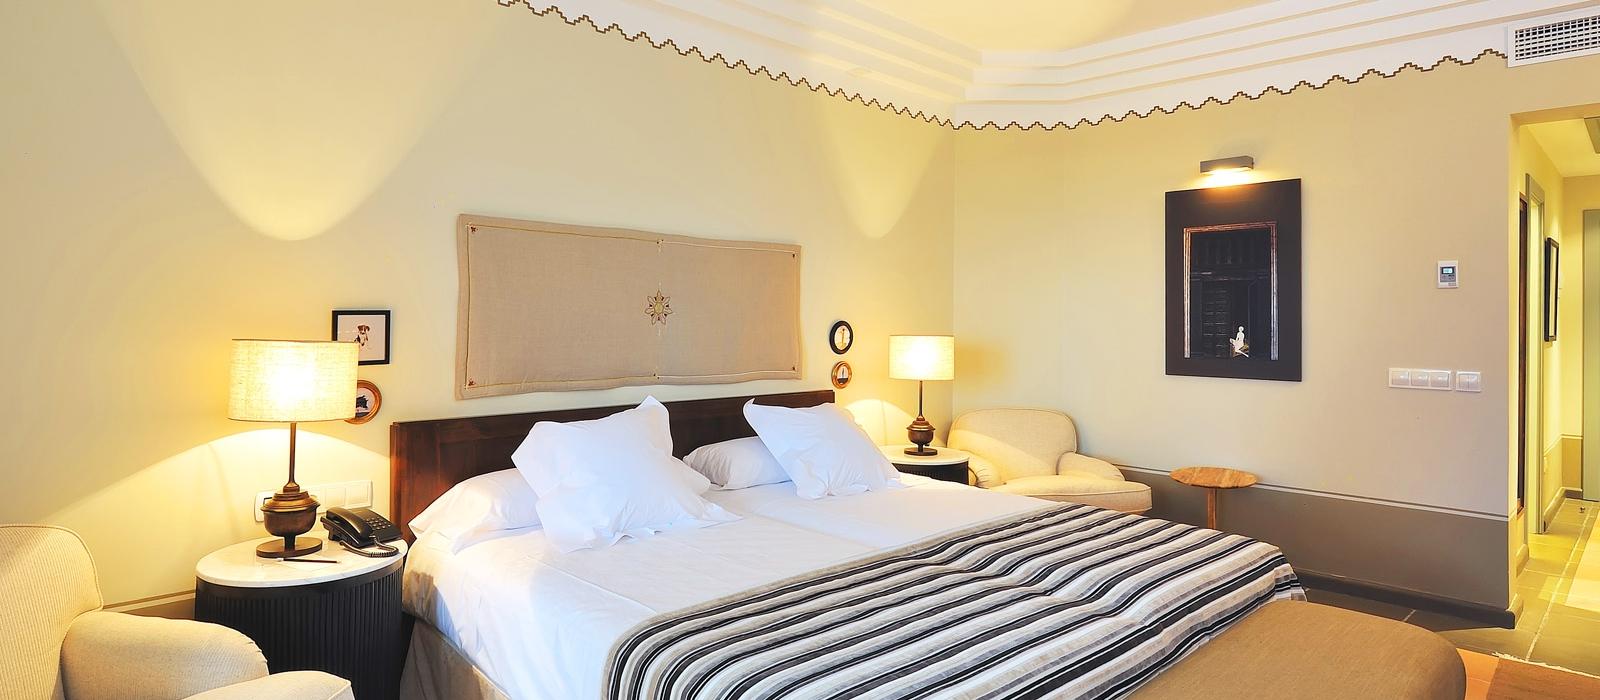 Promotions Hotel Vincci Estrella de Mar - Book now and save 10%